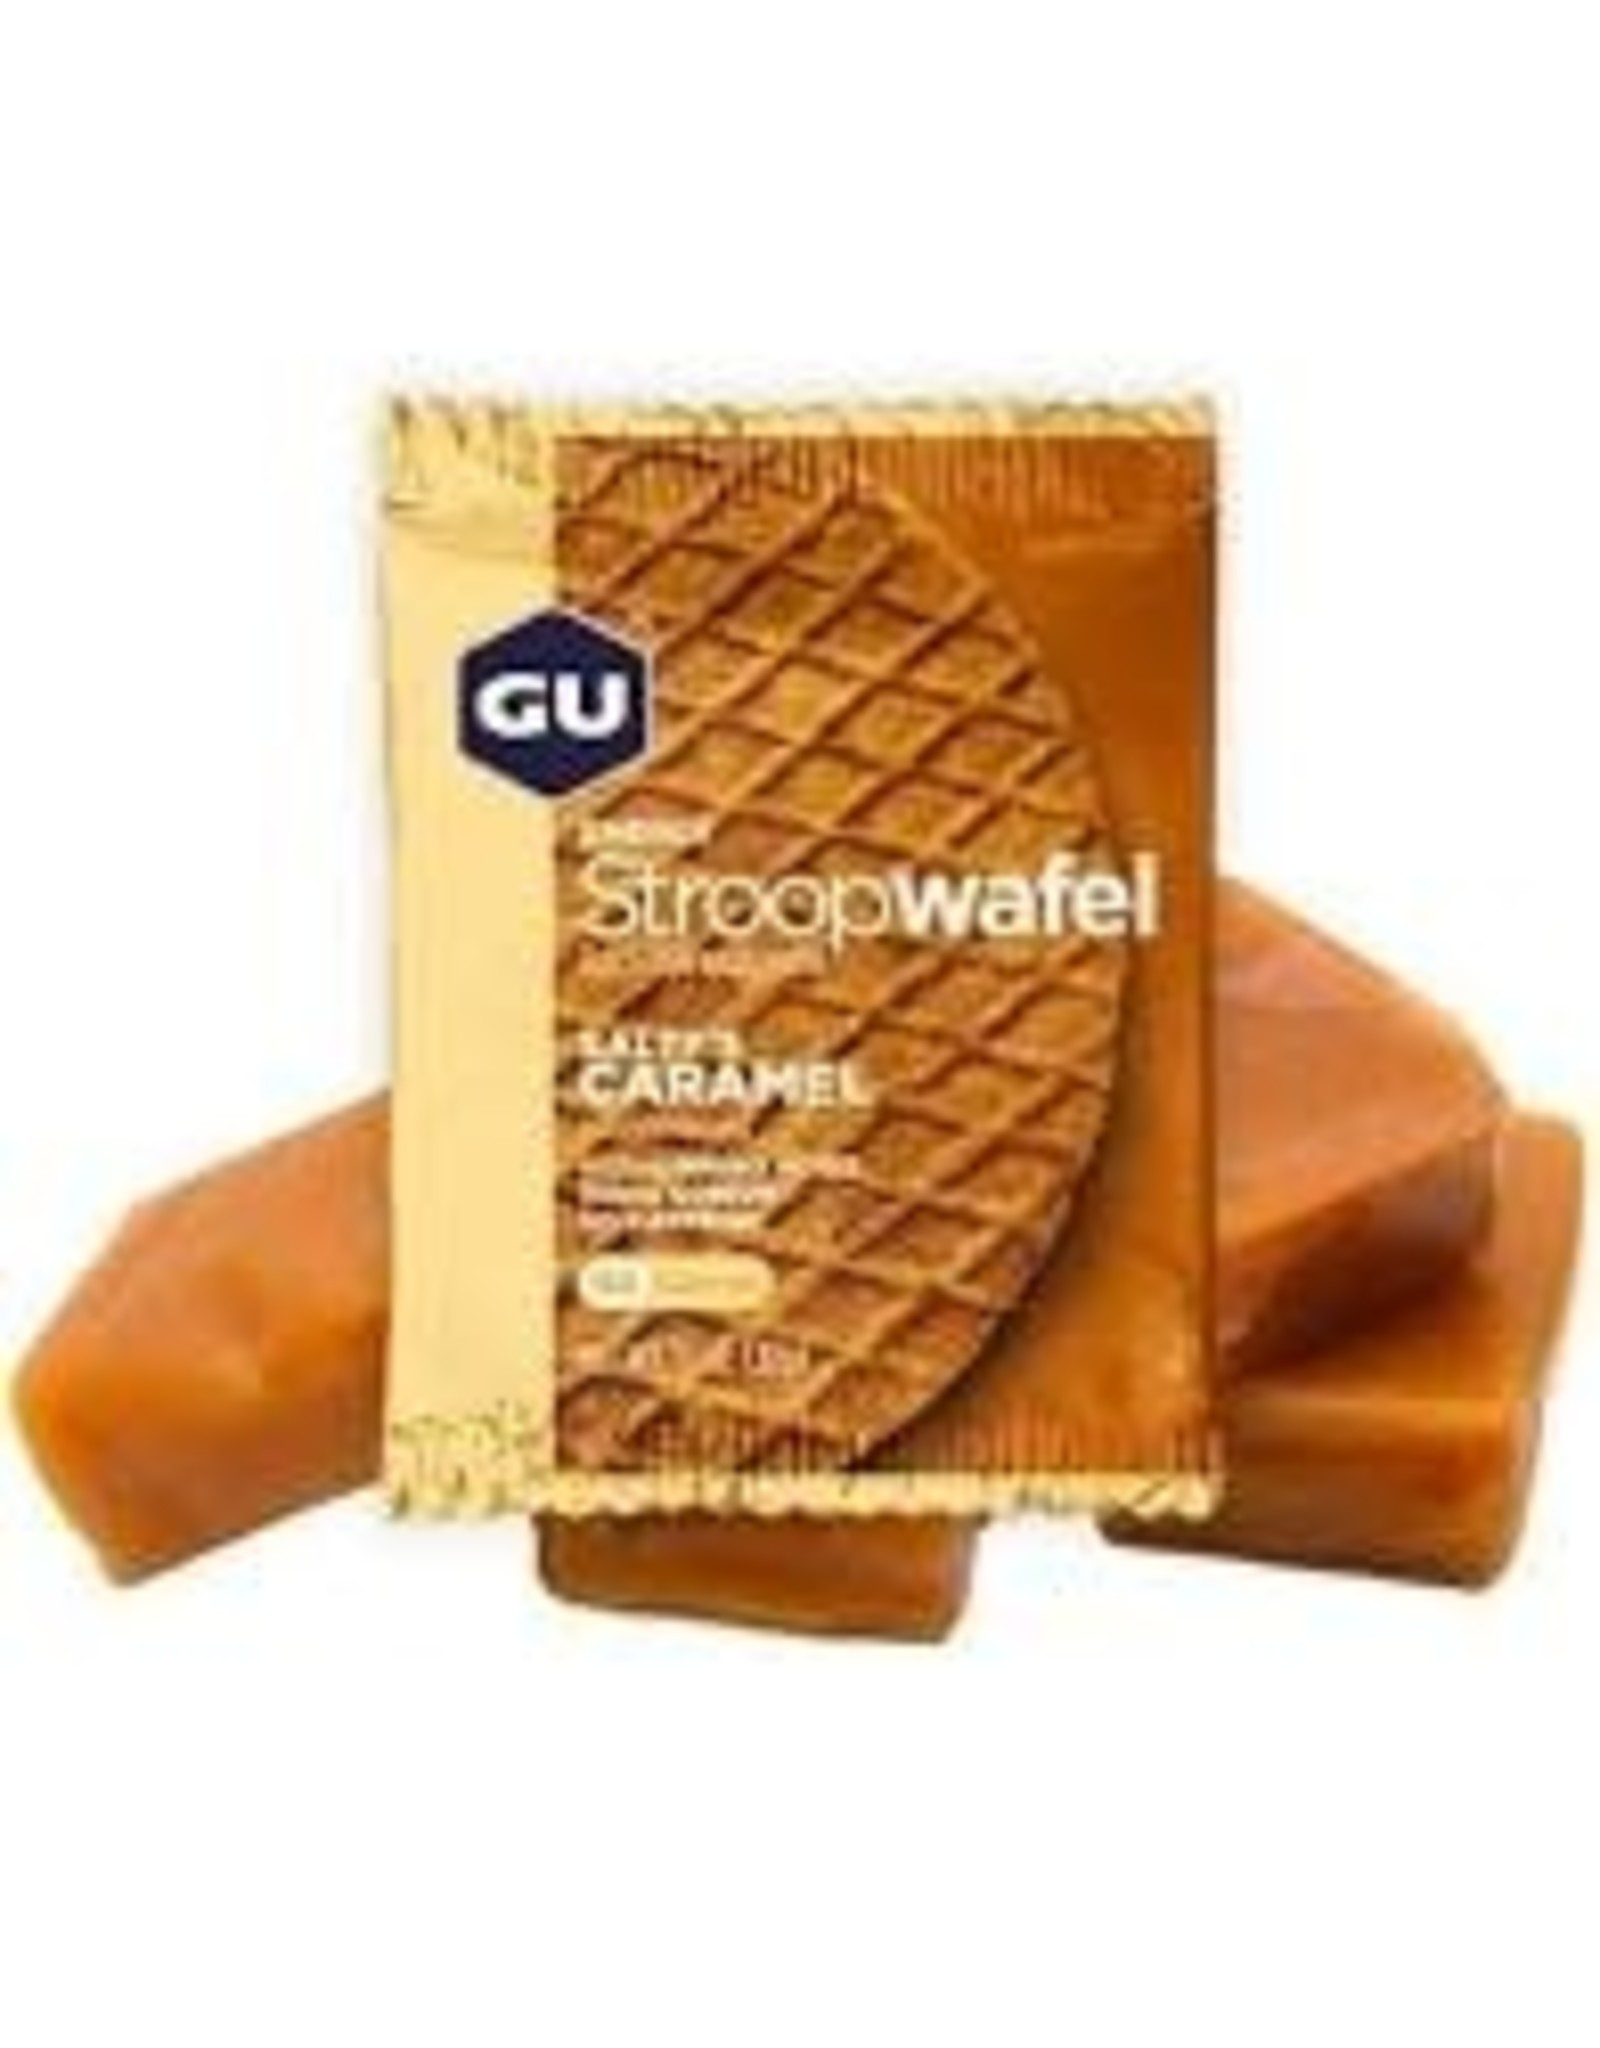 GU Waffle Salty's Caramel Box of 16 single